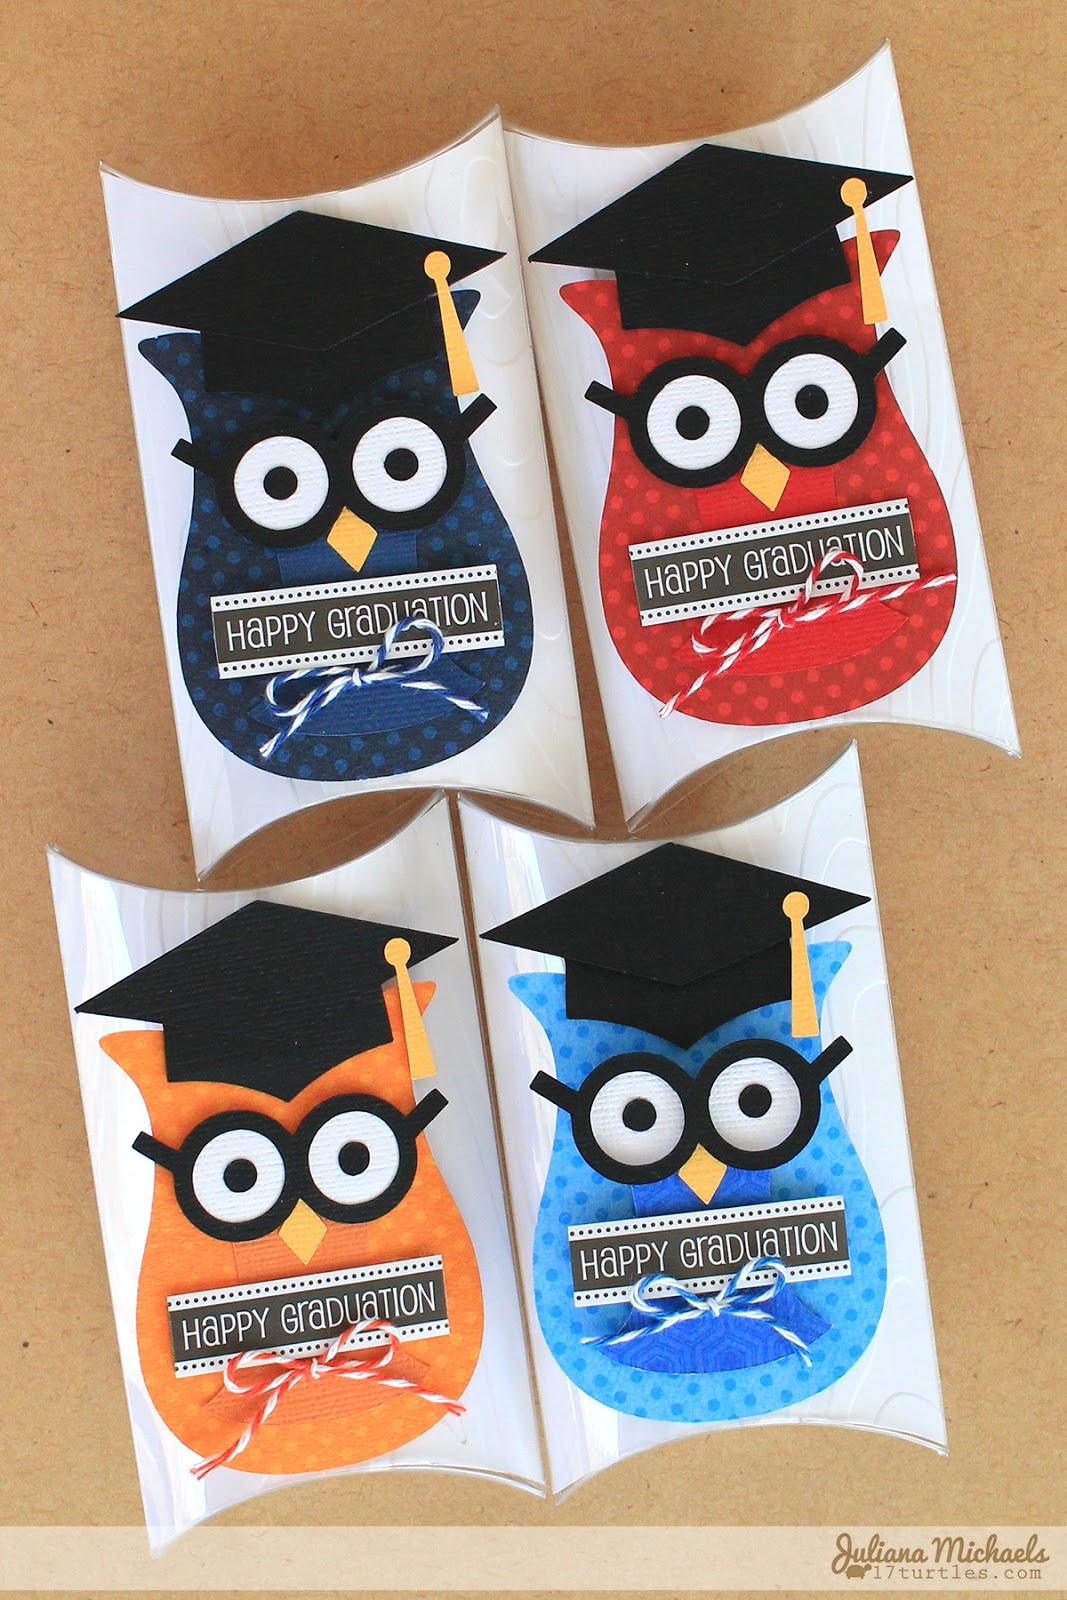 SRM Stickers Blog - DIY Graduation Pillow Boxes by Juliana  #graduation #favors  #DIY #kit #pillow box #twine #stickers